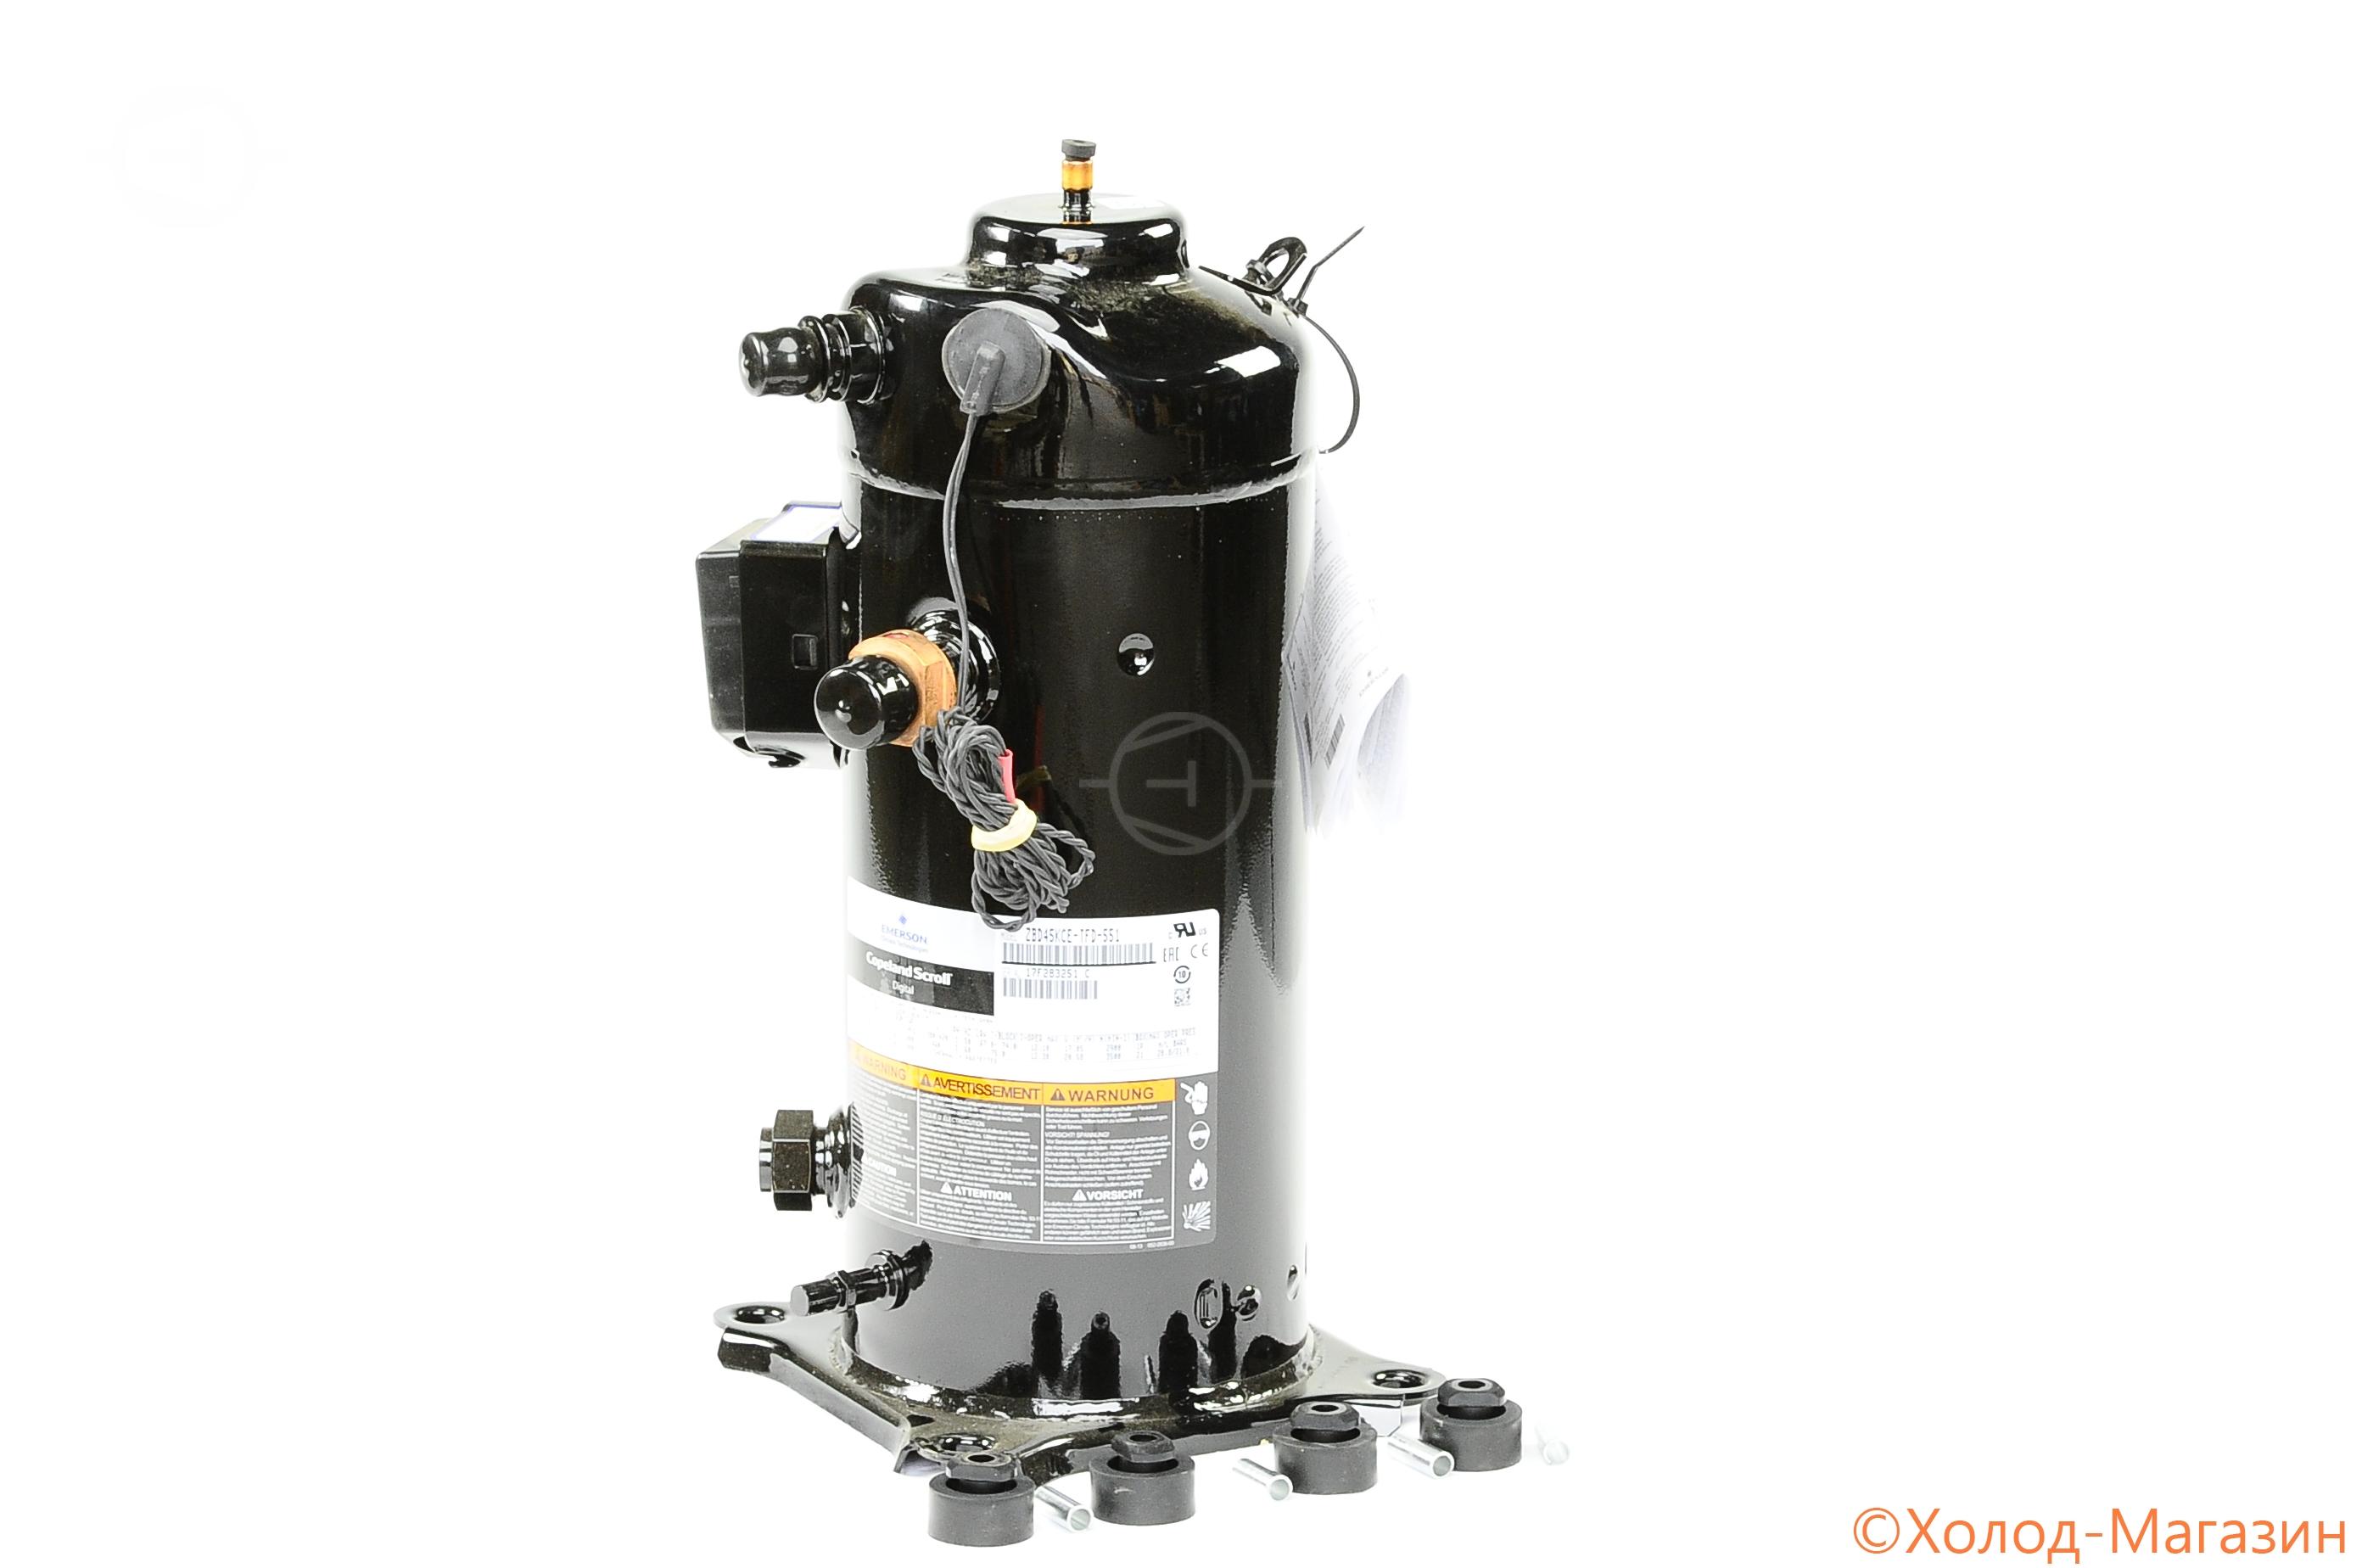 Компрессор спиральный ZBD 45 KCE-TFD-551 Copeland, Emerson